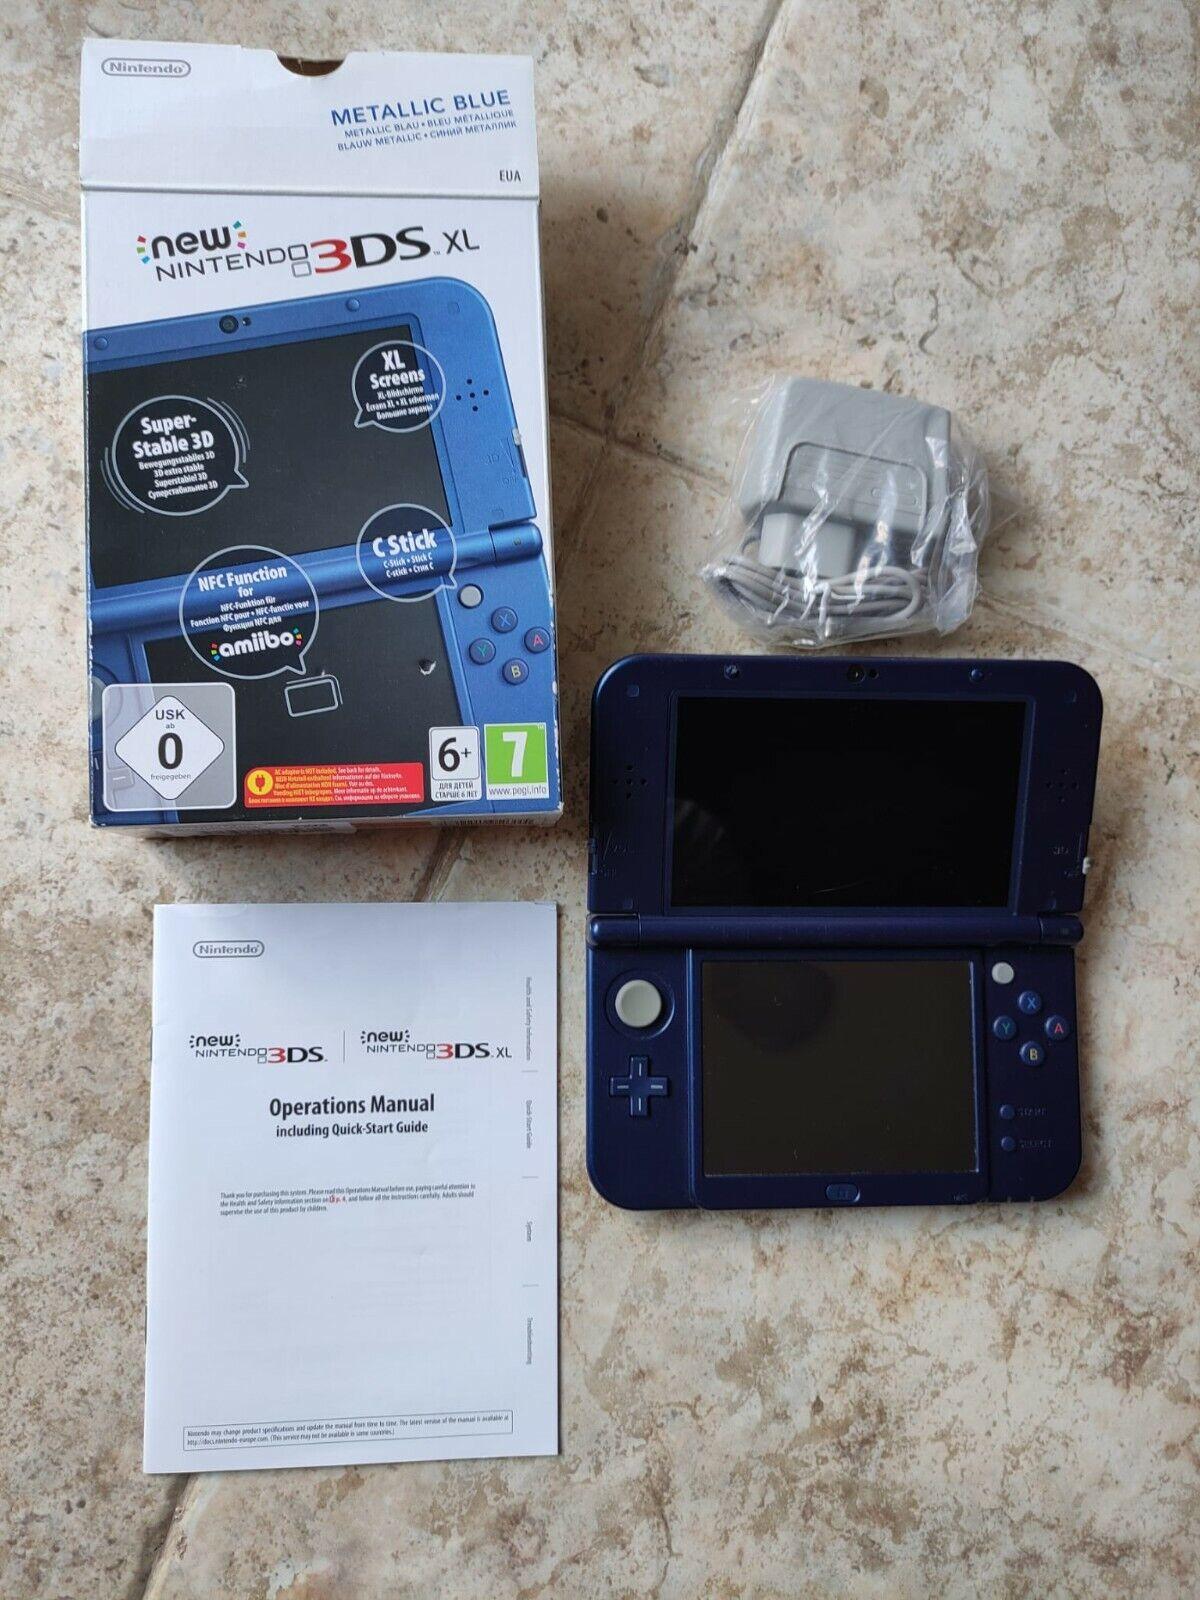 Nintendo New 3DS XL azul metalico con caja, ( Con cargador incluido...